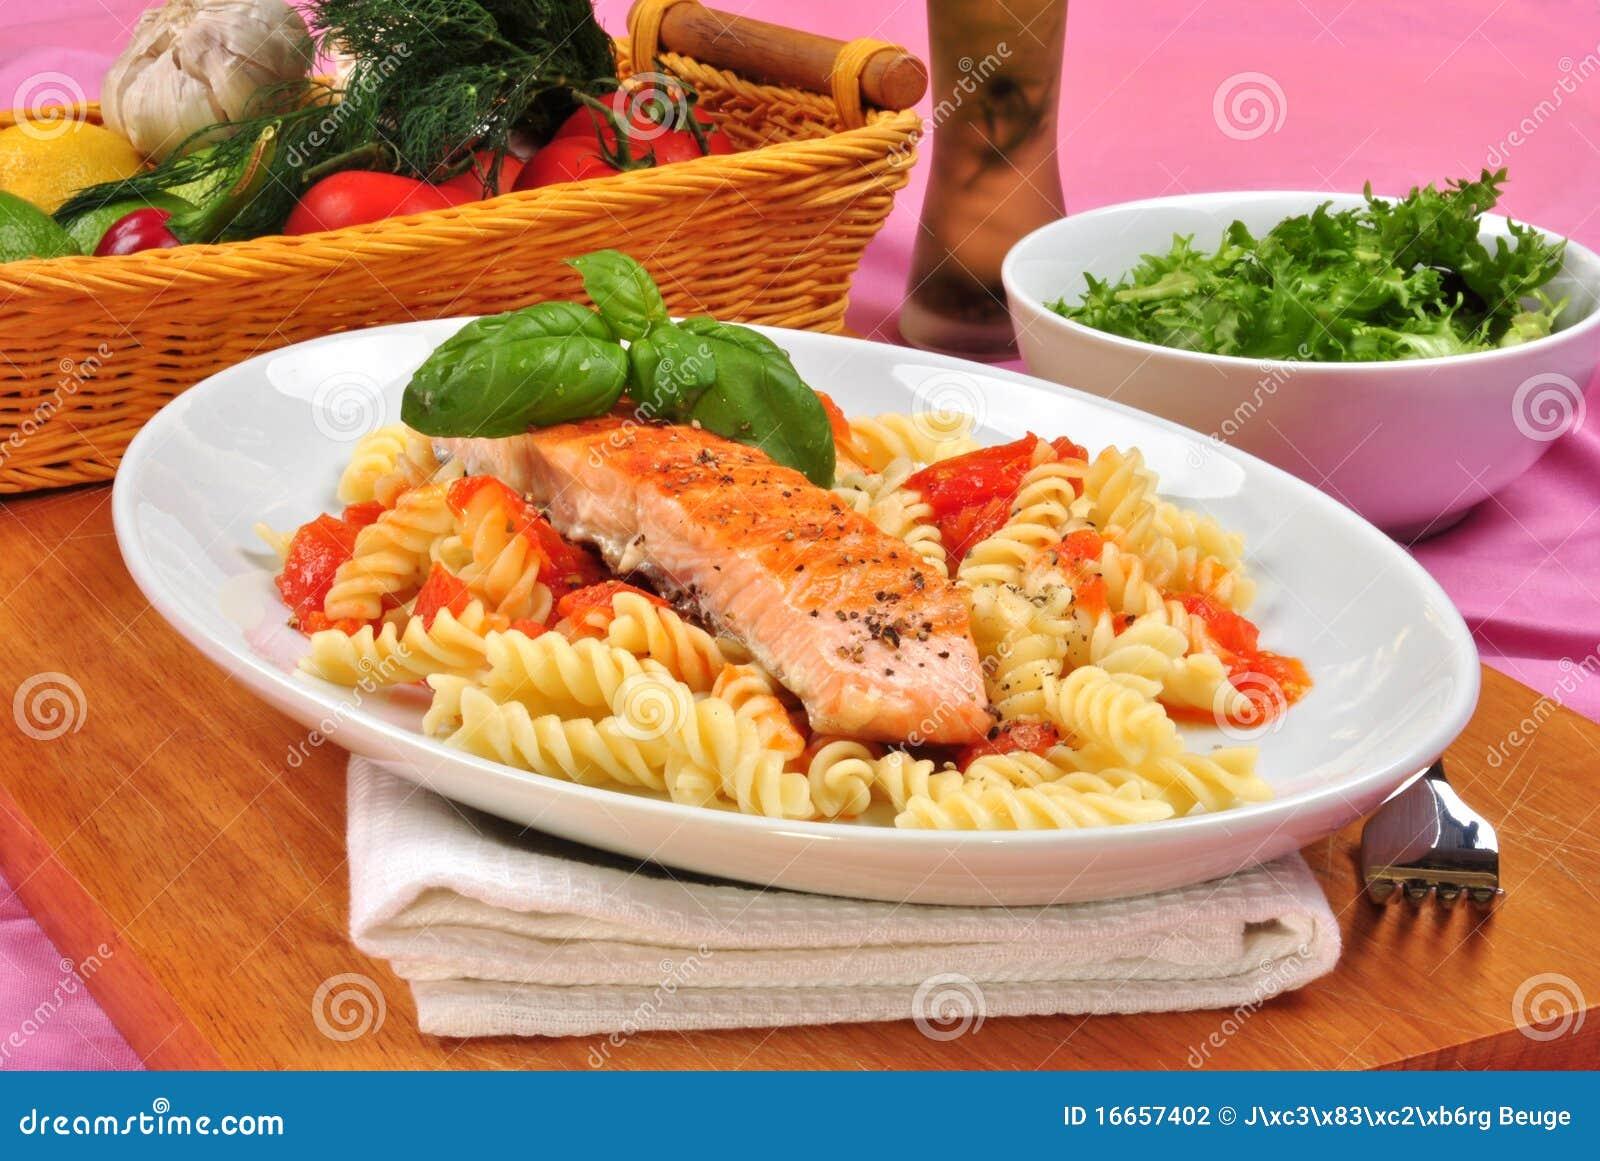 Grilled Salmon On Some Tomato Pasta Stock Photography ...